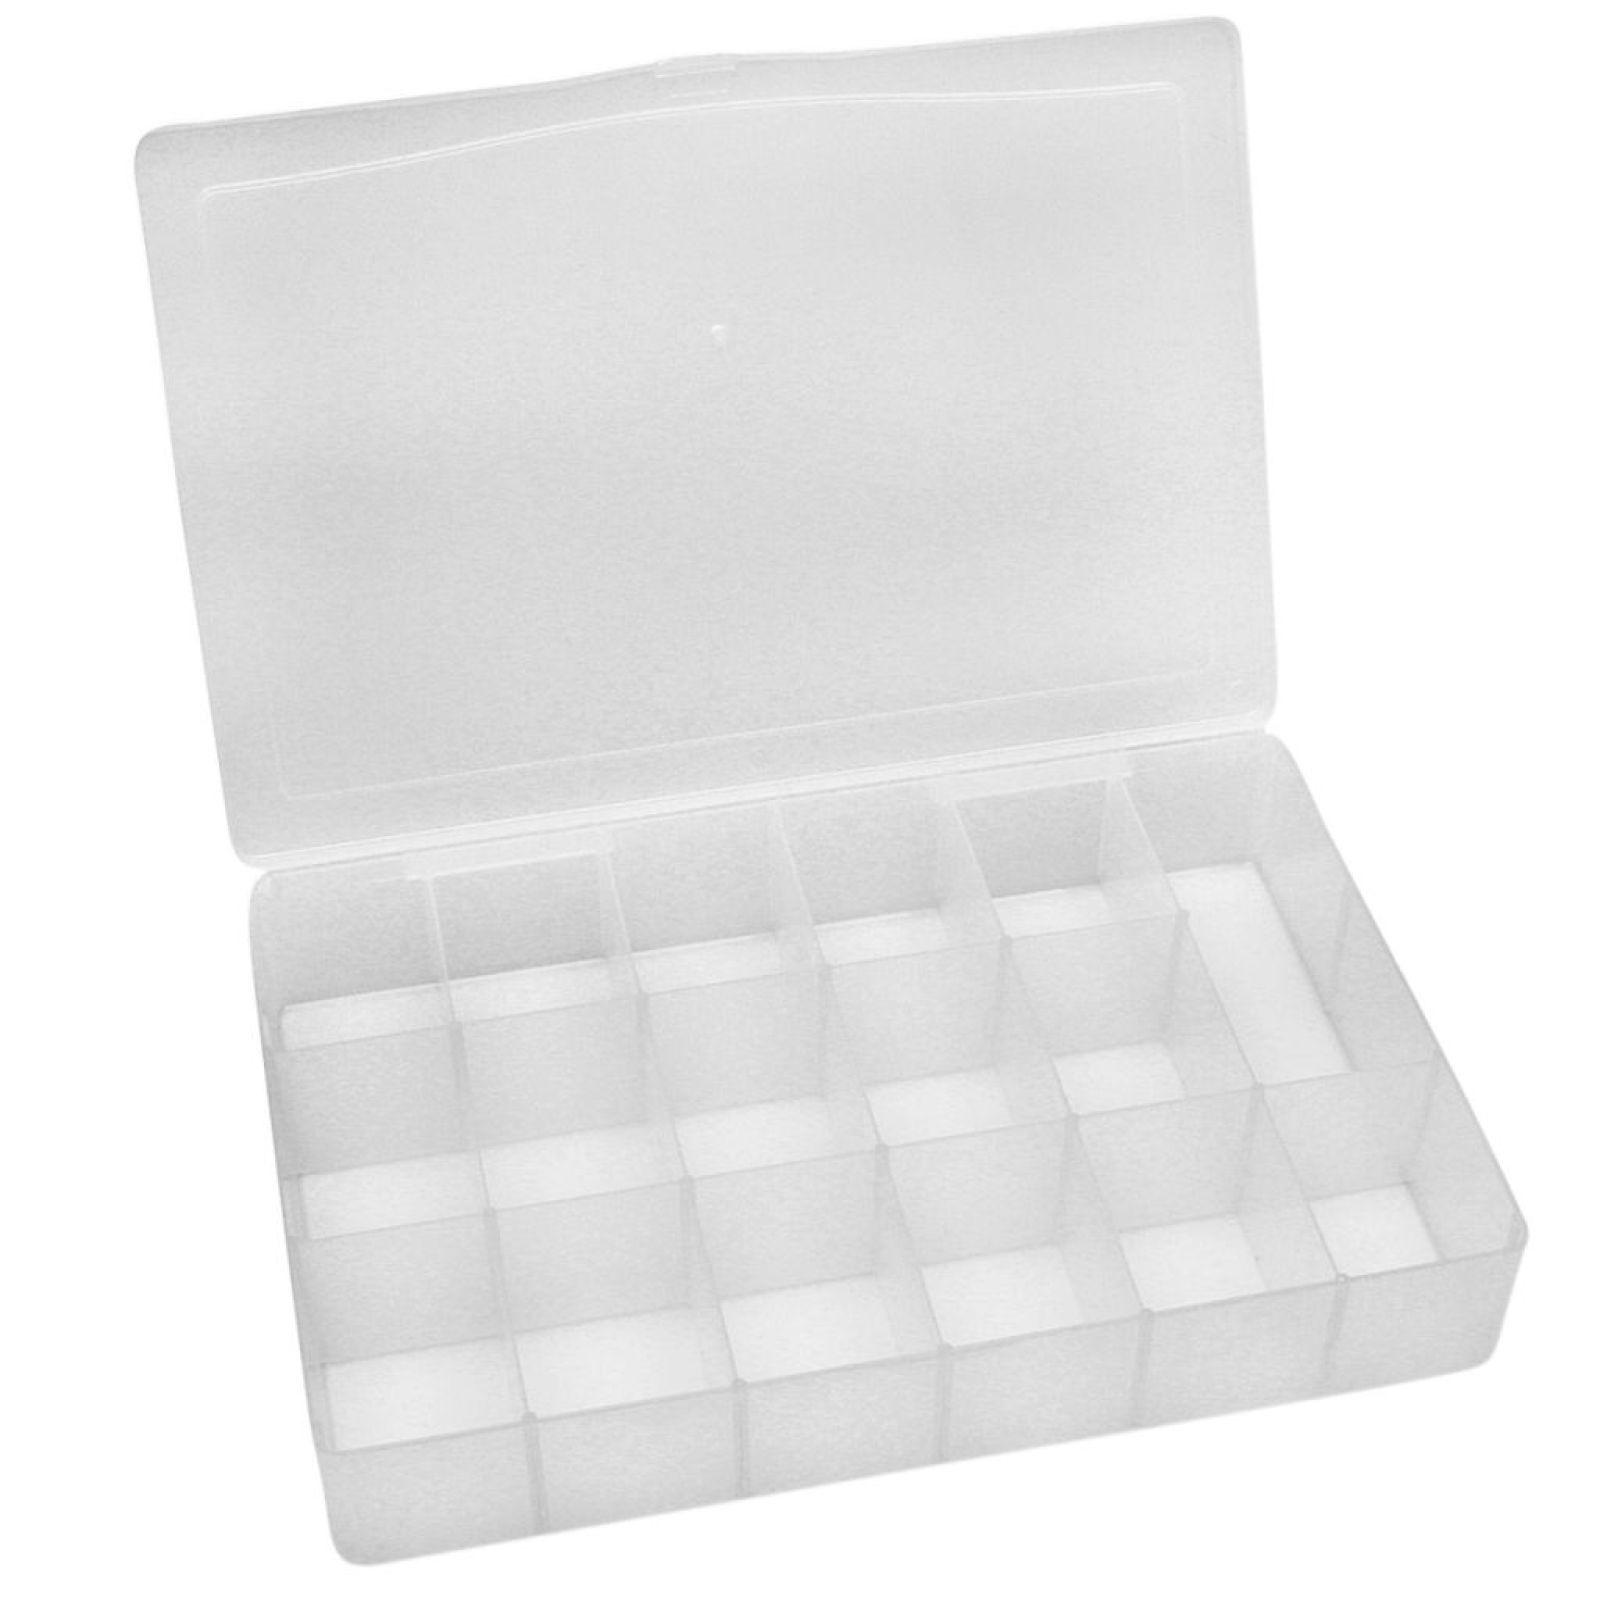 Darice® 17 Compartment Bead Organizer. Plastic Storage ContainersBeaded ...  sc 1 st  Pinterest & Darice 17 Compartment Bead Organizer   Beads Plastic storage ...